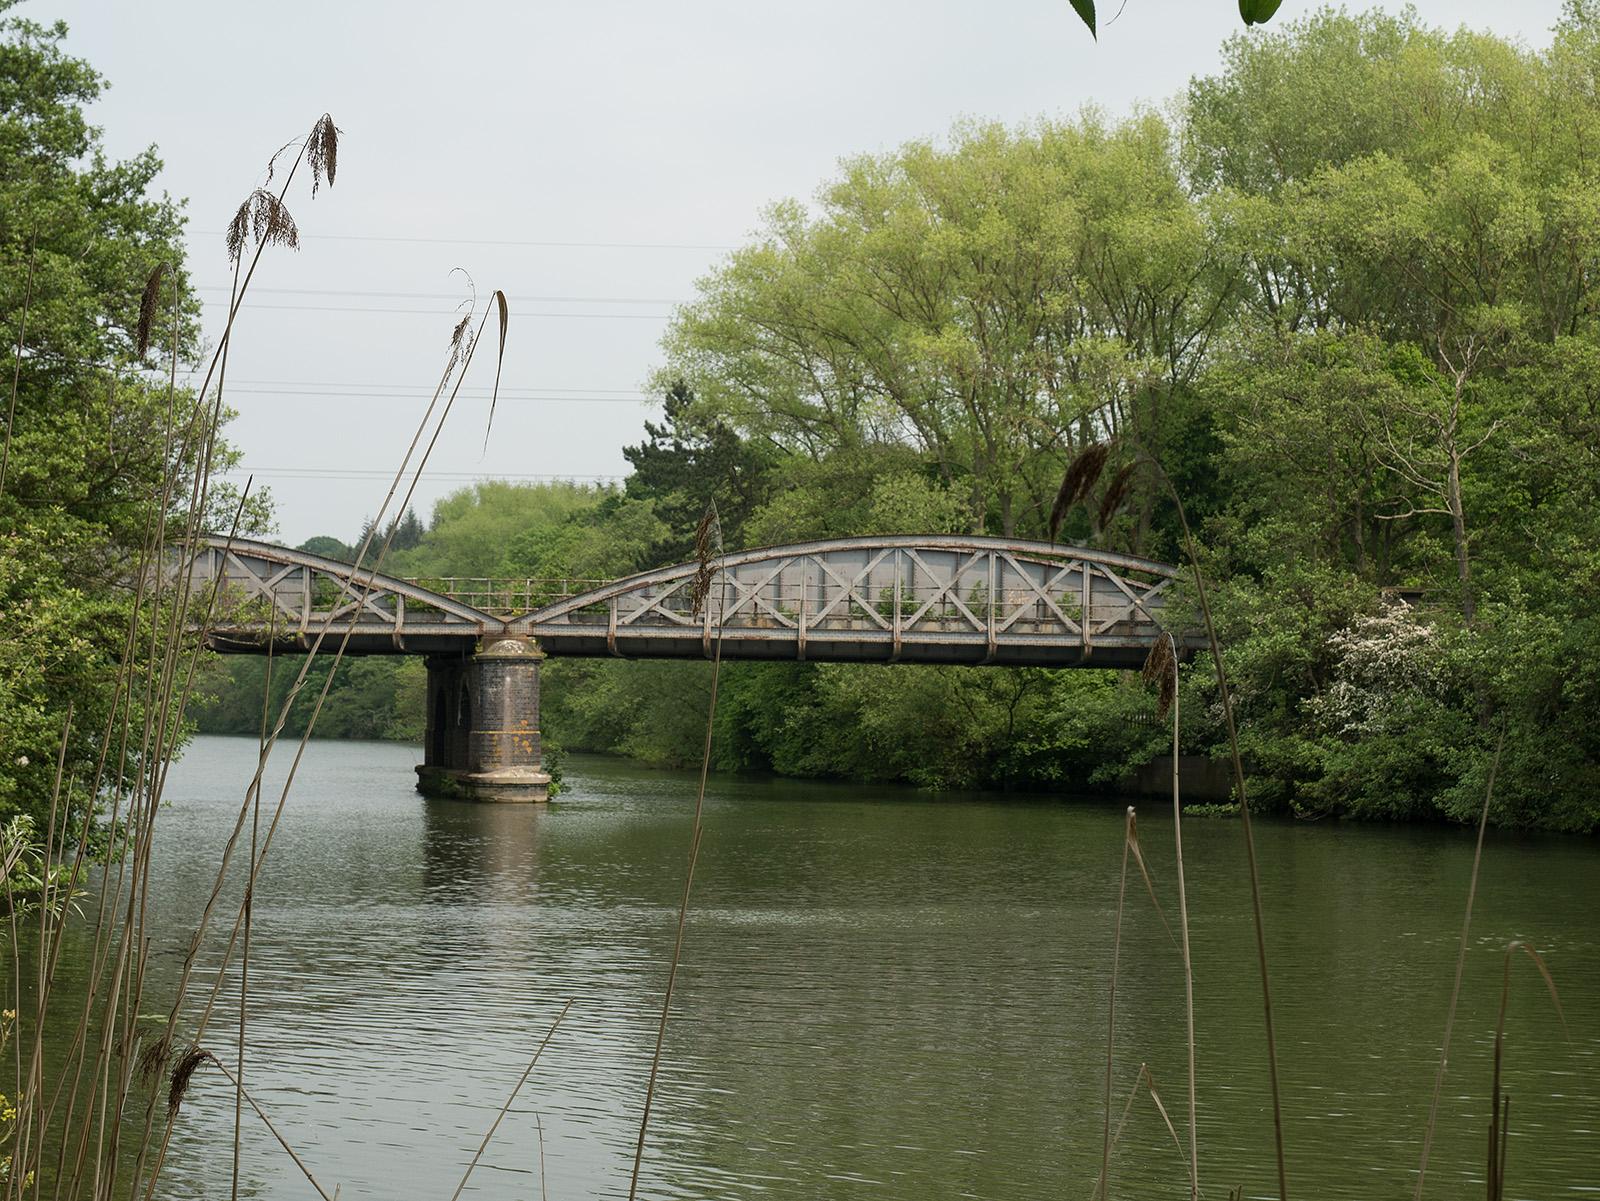 Nuneham railway bridge